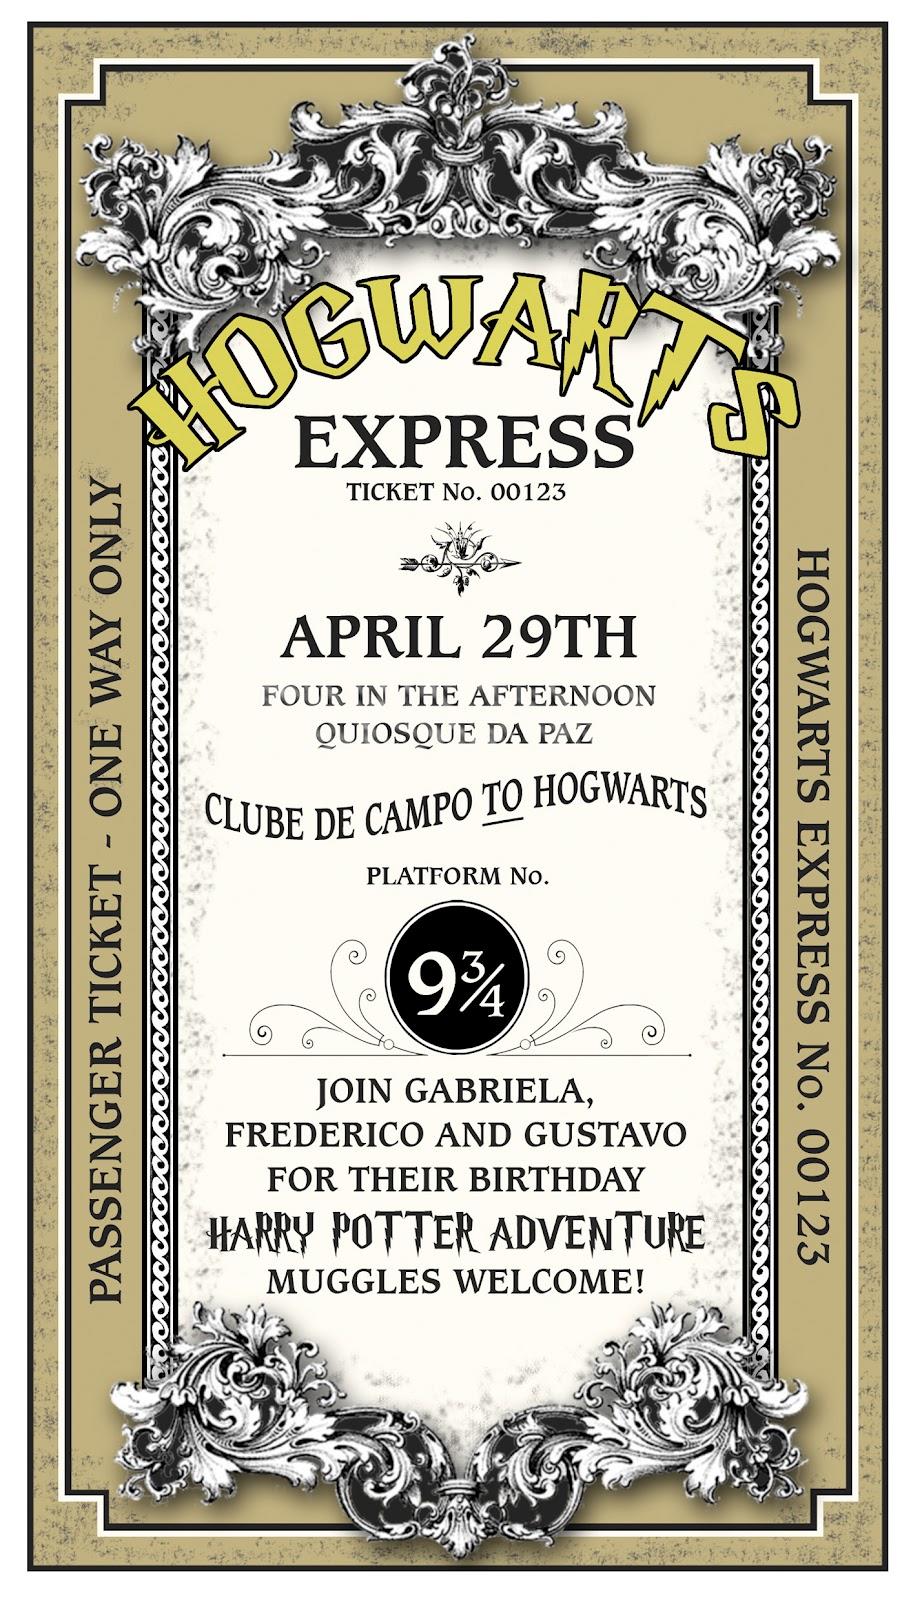 Tema de festa: Harry Potter! : ᐅ Mil dicas de mãe